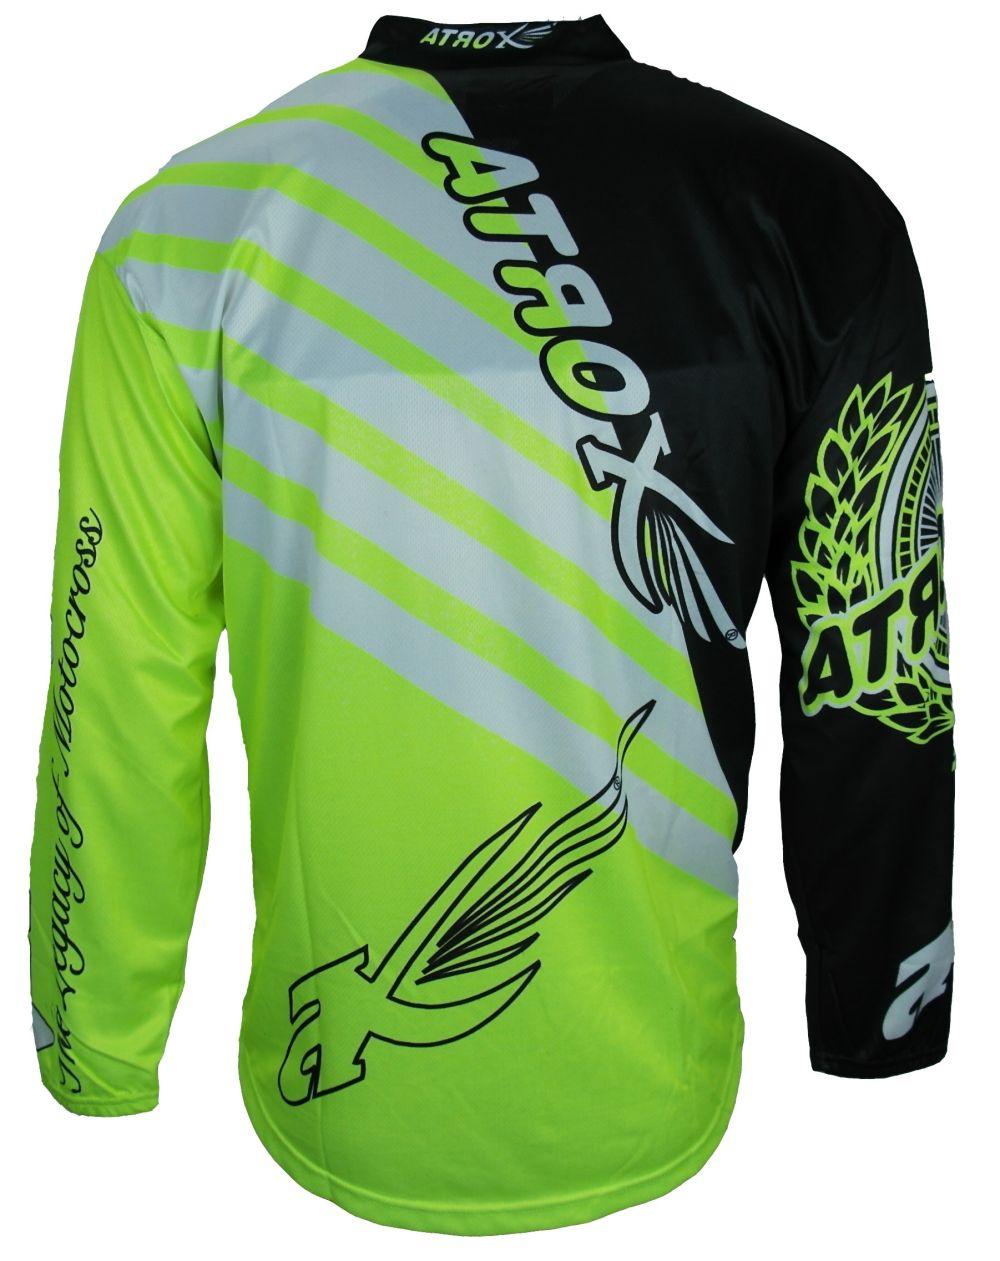 Heyberry MX-Cross Quad Motocross Shirt Jersey Trikot schwarz weiß grün M bis XXL